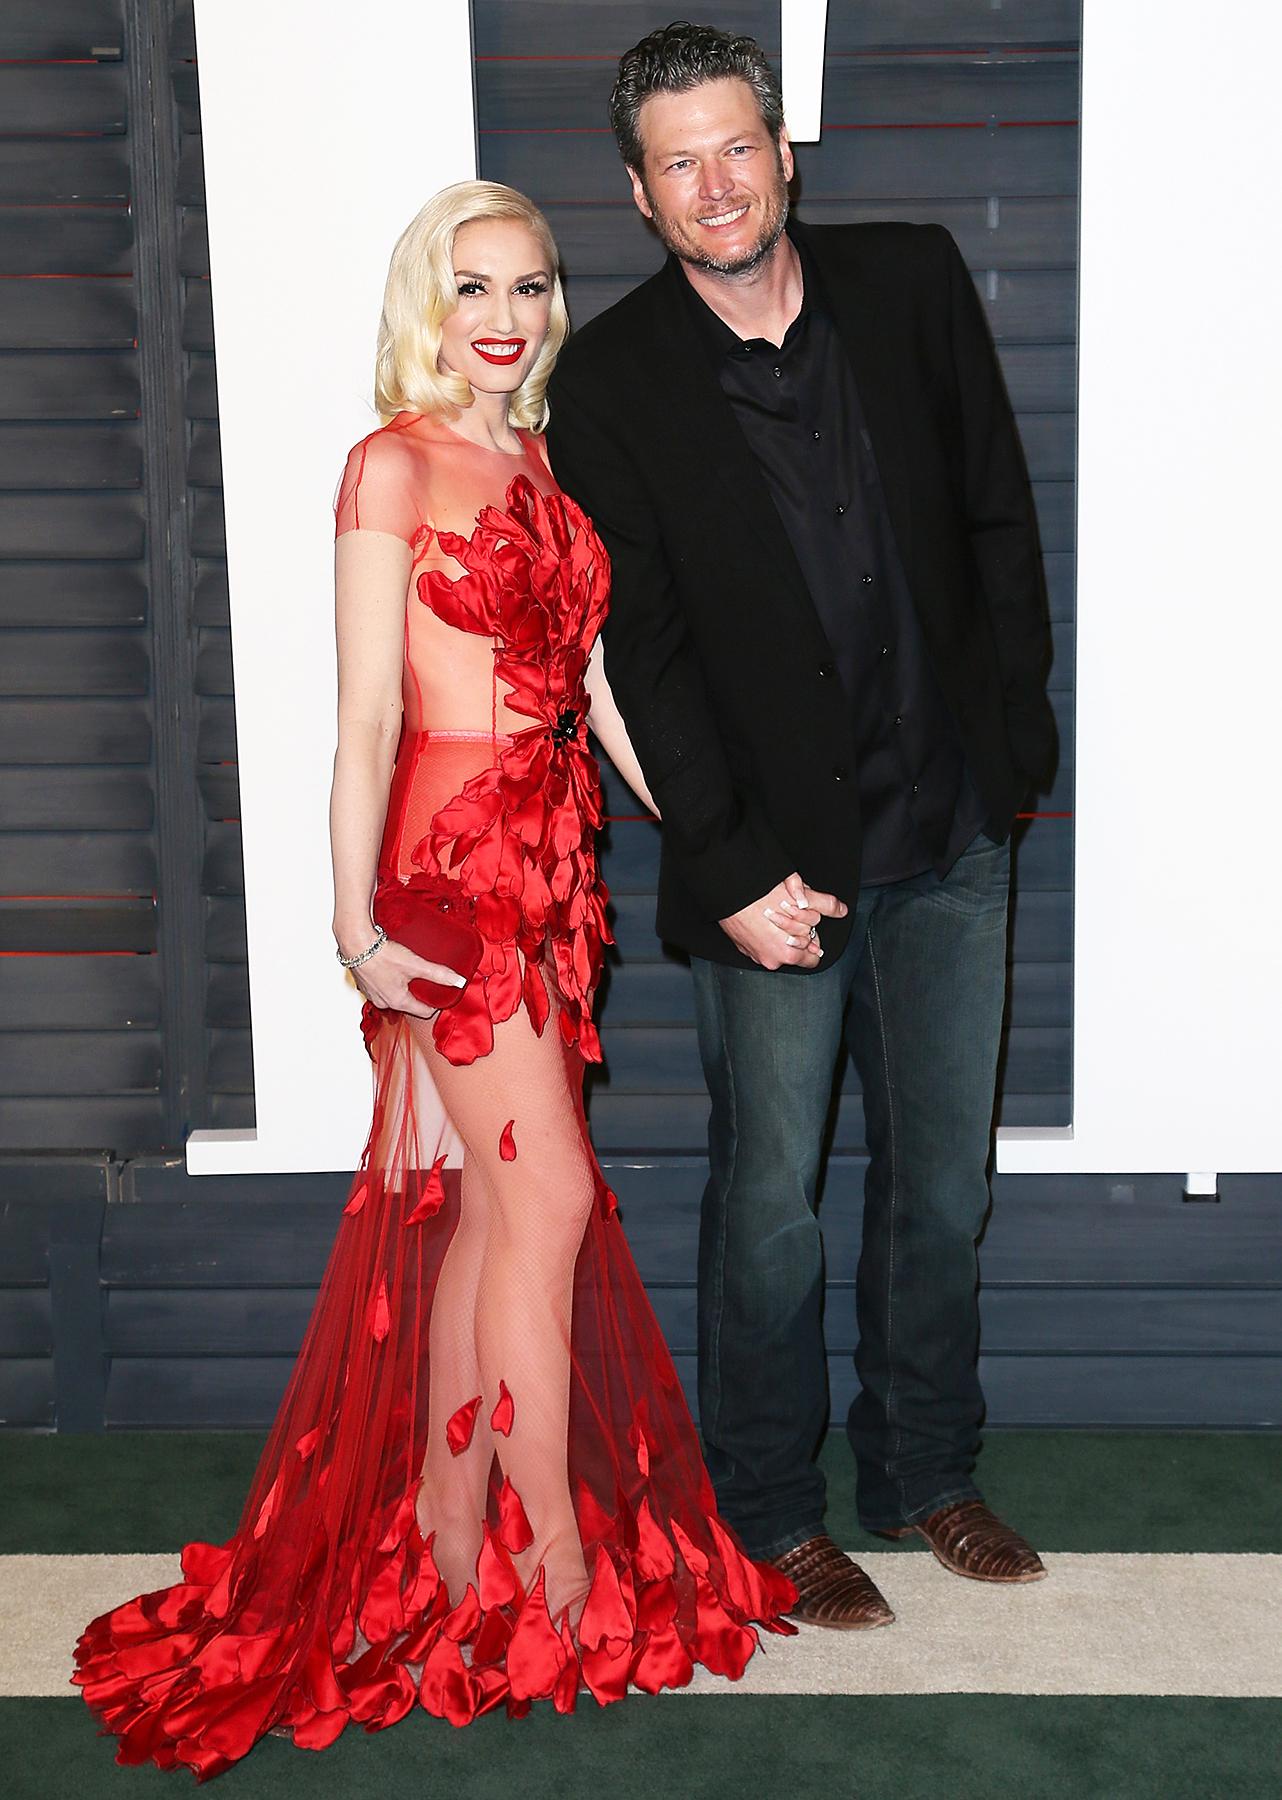 She Said Yes! Gwen Stefani and Blake Shelton's Relationship Timeline